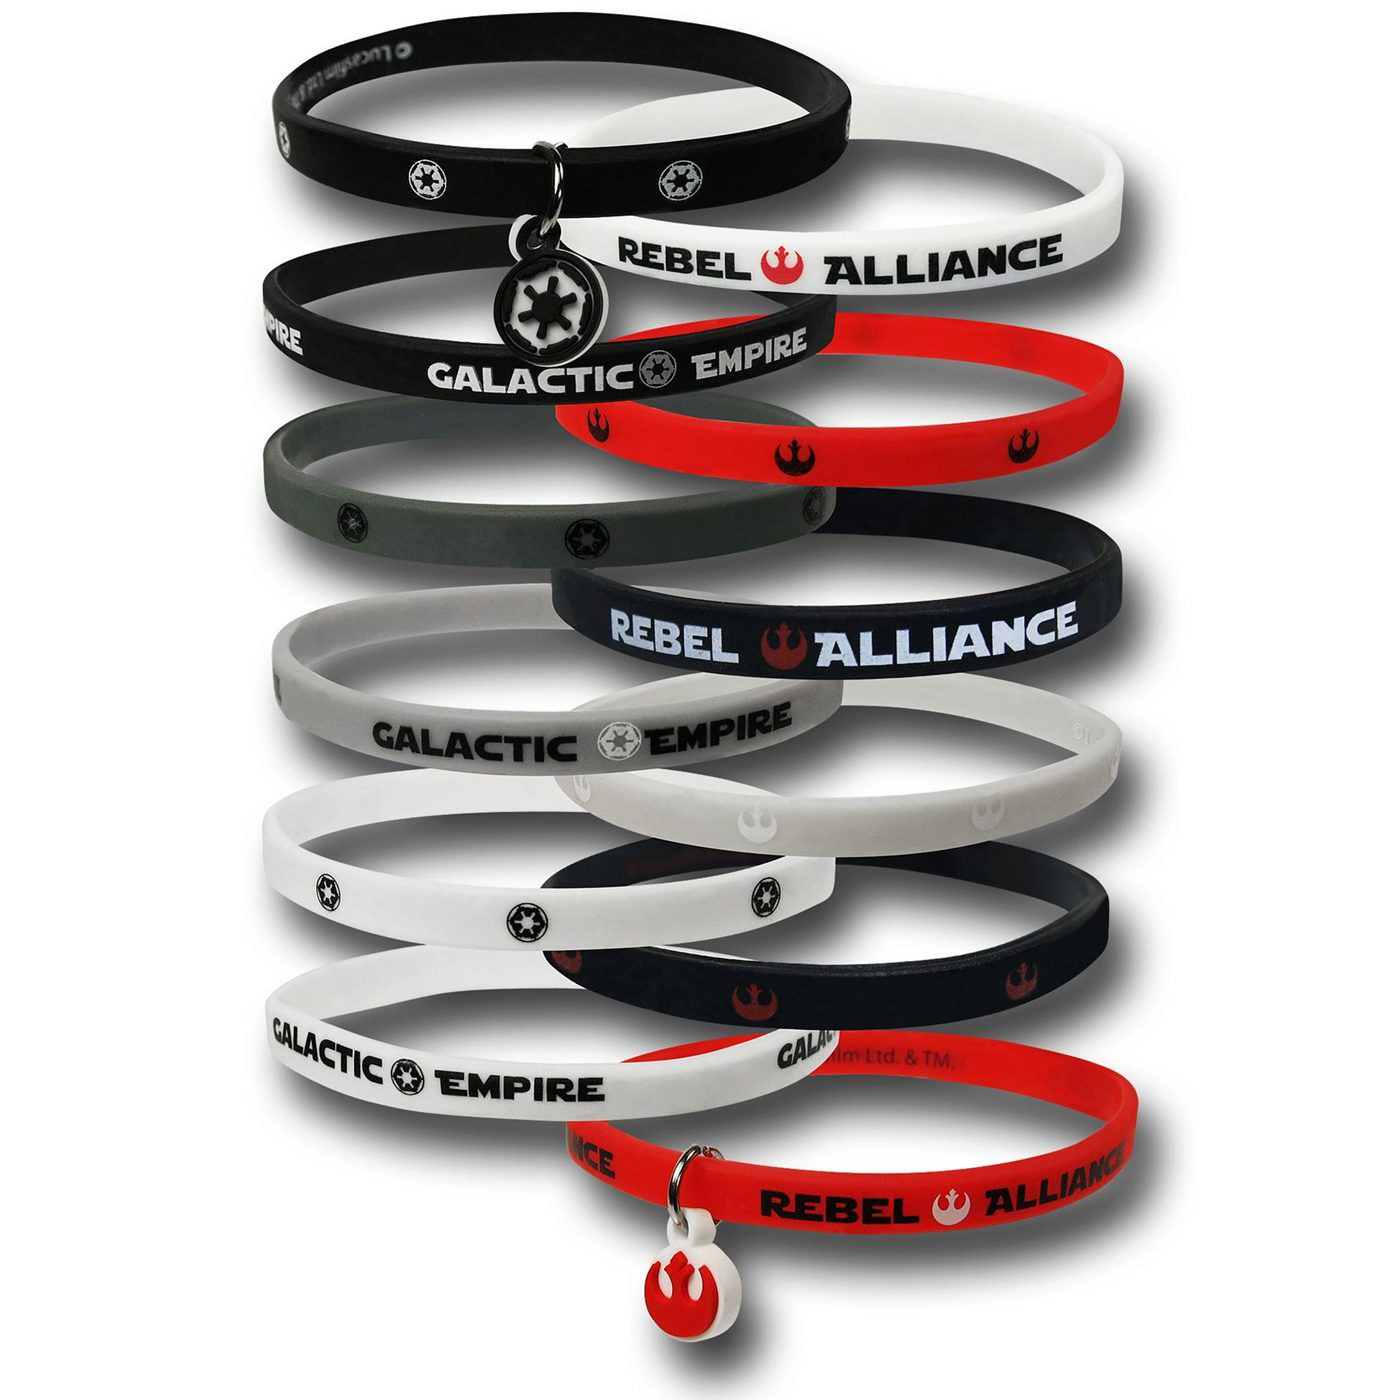 Star Wars Rubber Wristband Set